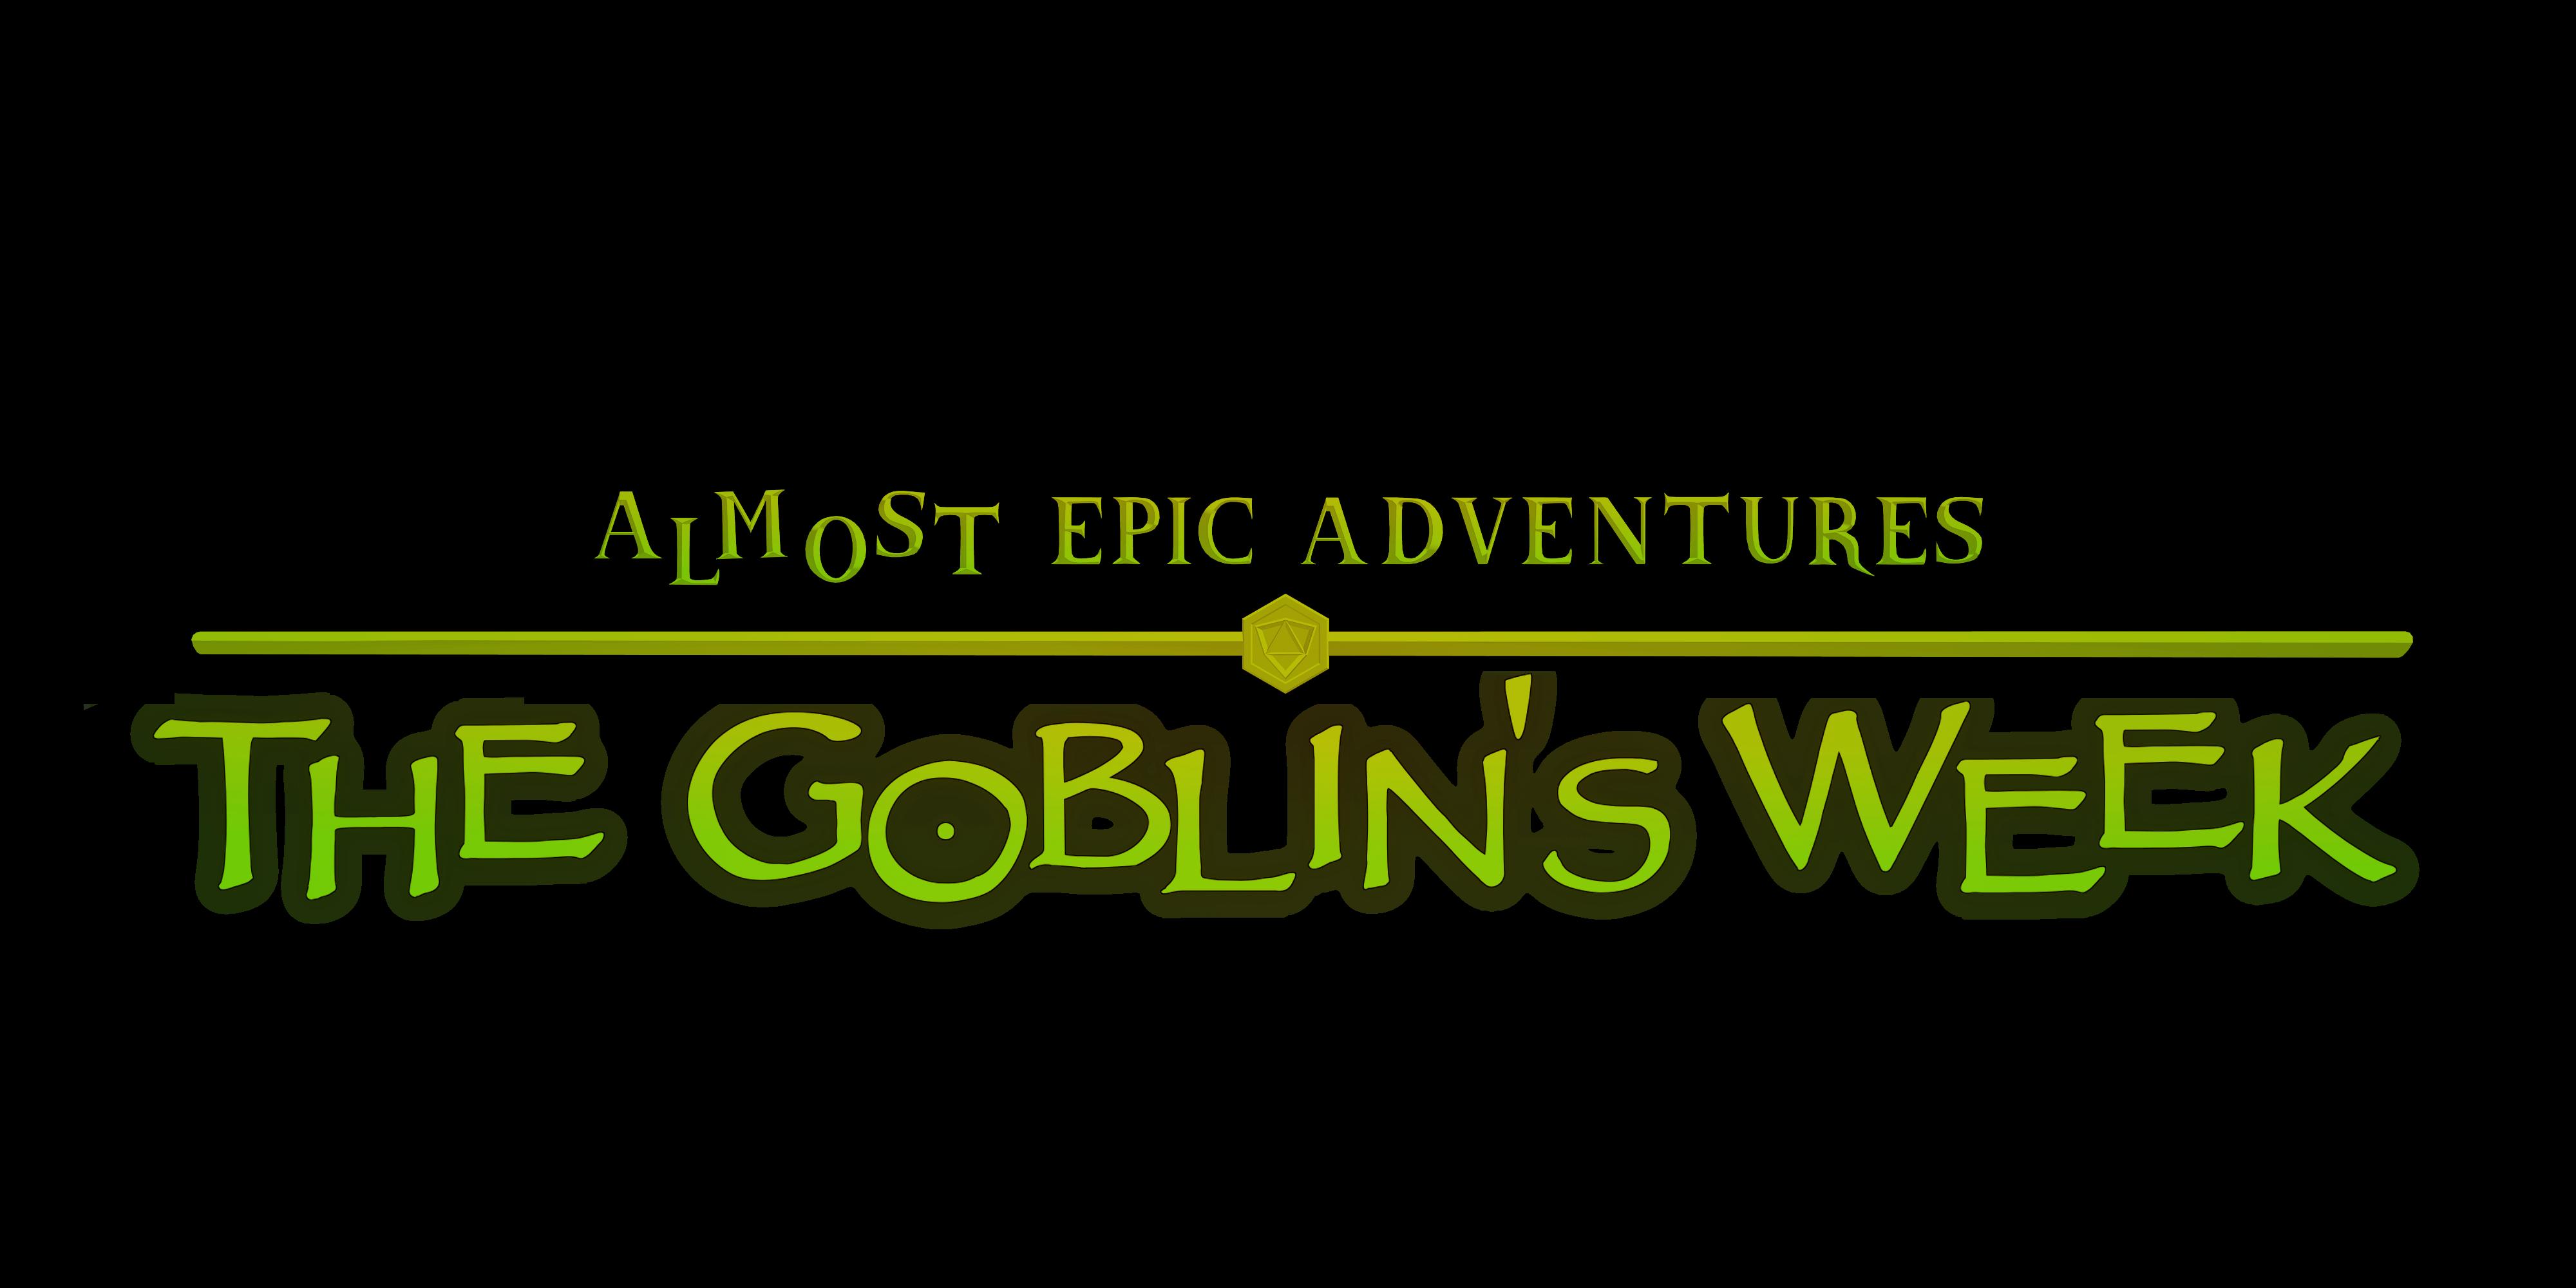 IMAGE(https://www.wildmagegames.com/wp-content/uploads/2015/11/logo12_green.png)